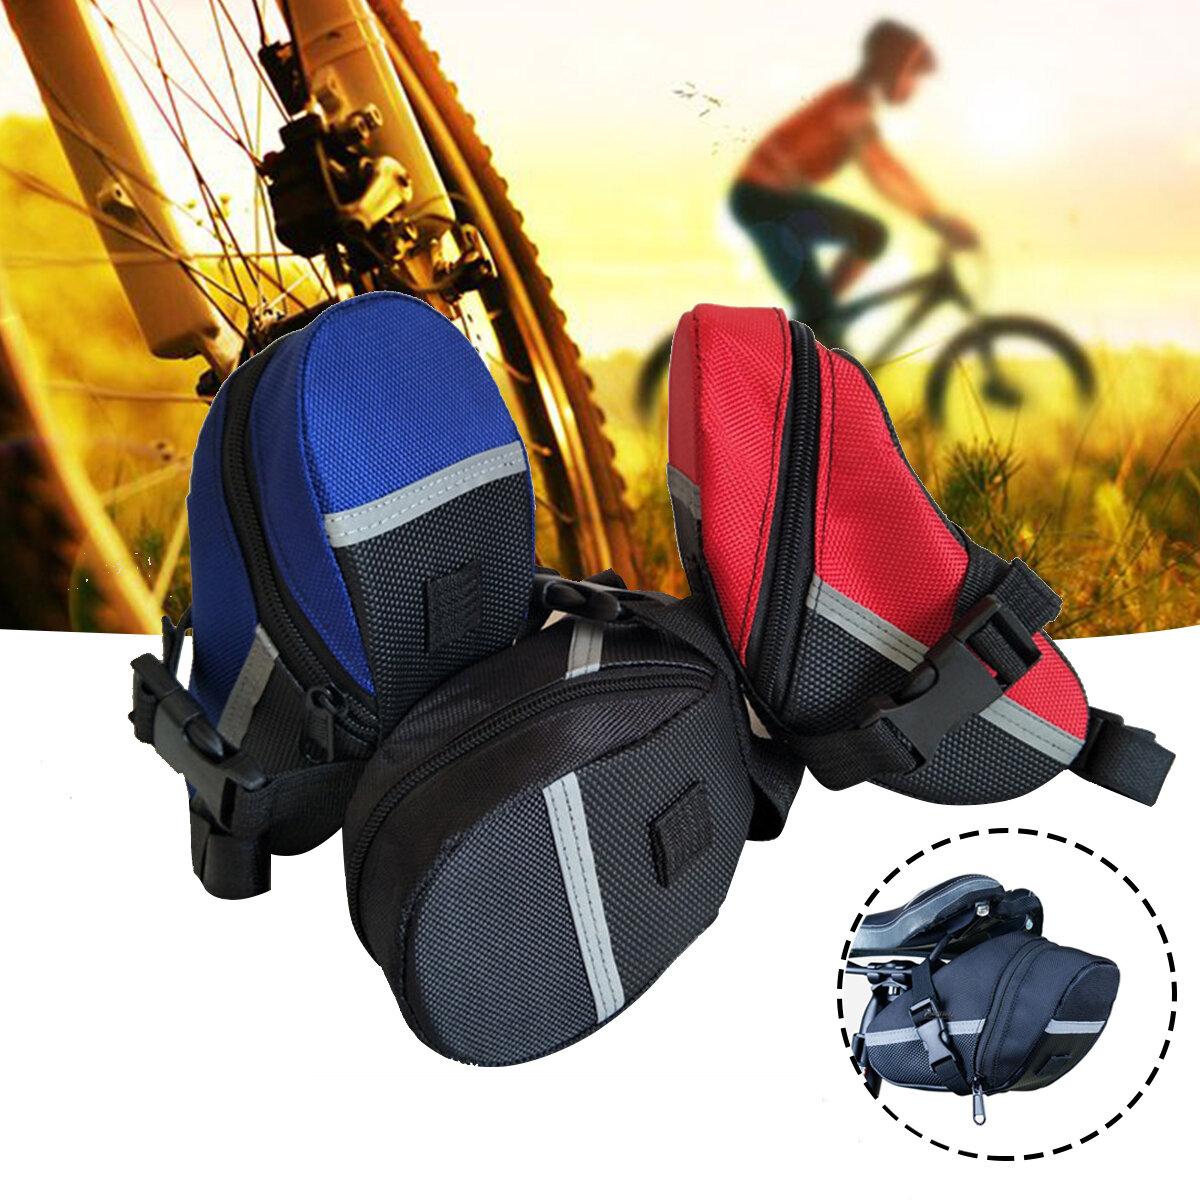 Sillín de bicicleta BIKIGHT Bolsa Asiento trasero de bicicleta Bolsa Cuero PU Impermeable Almacenamiento trasero Bolsa a